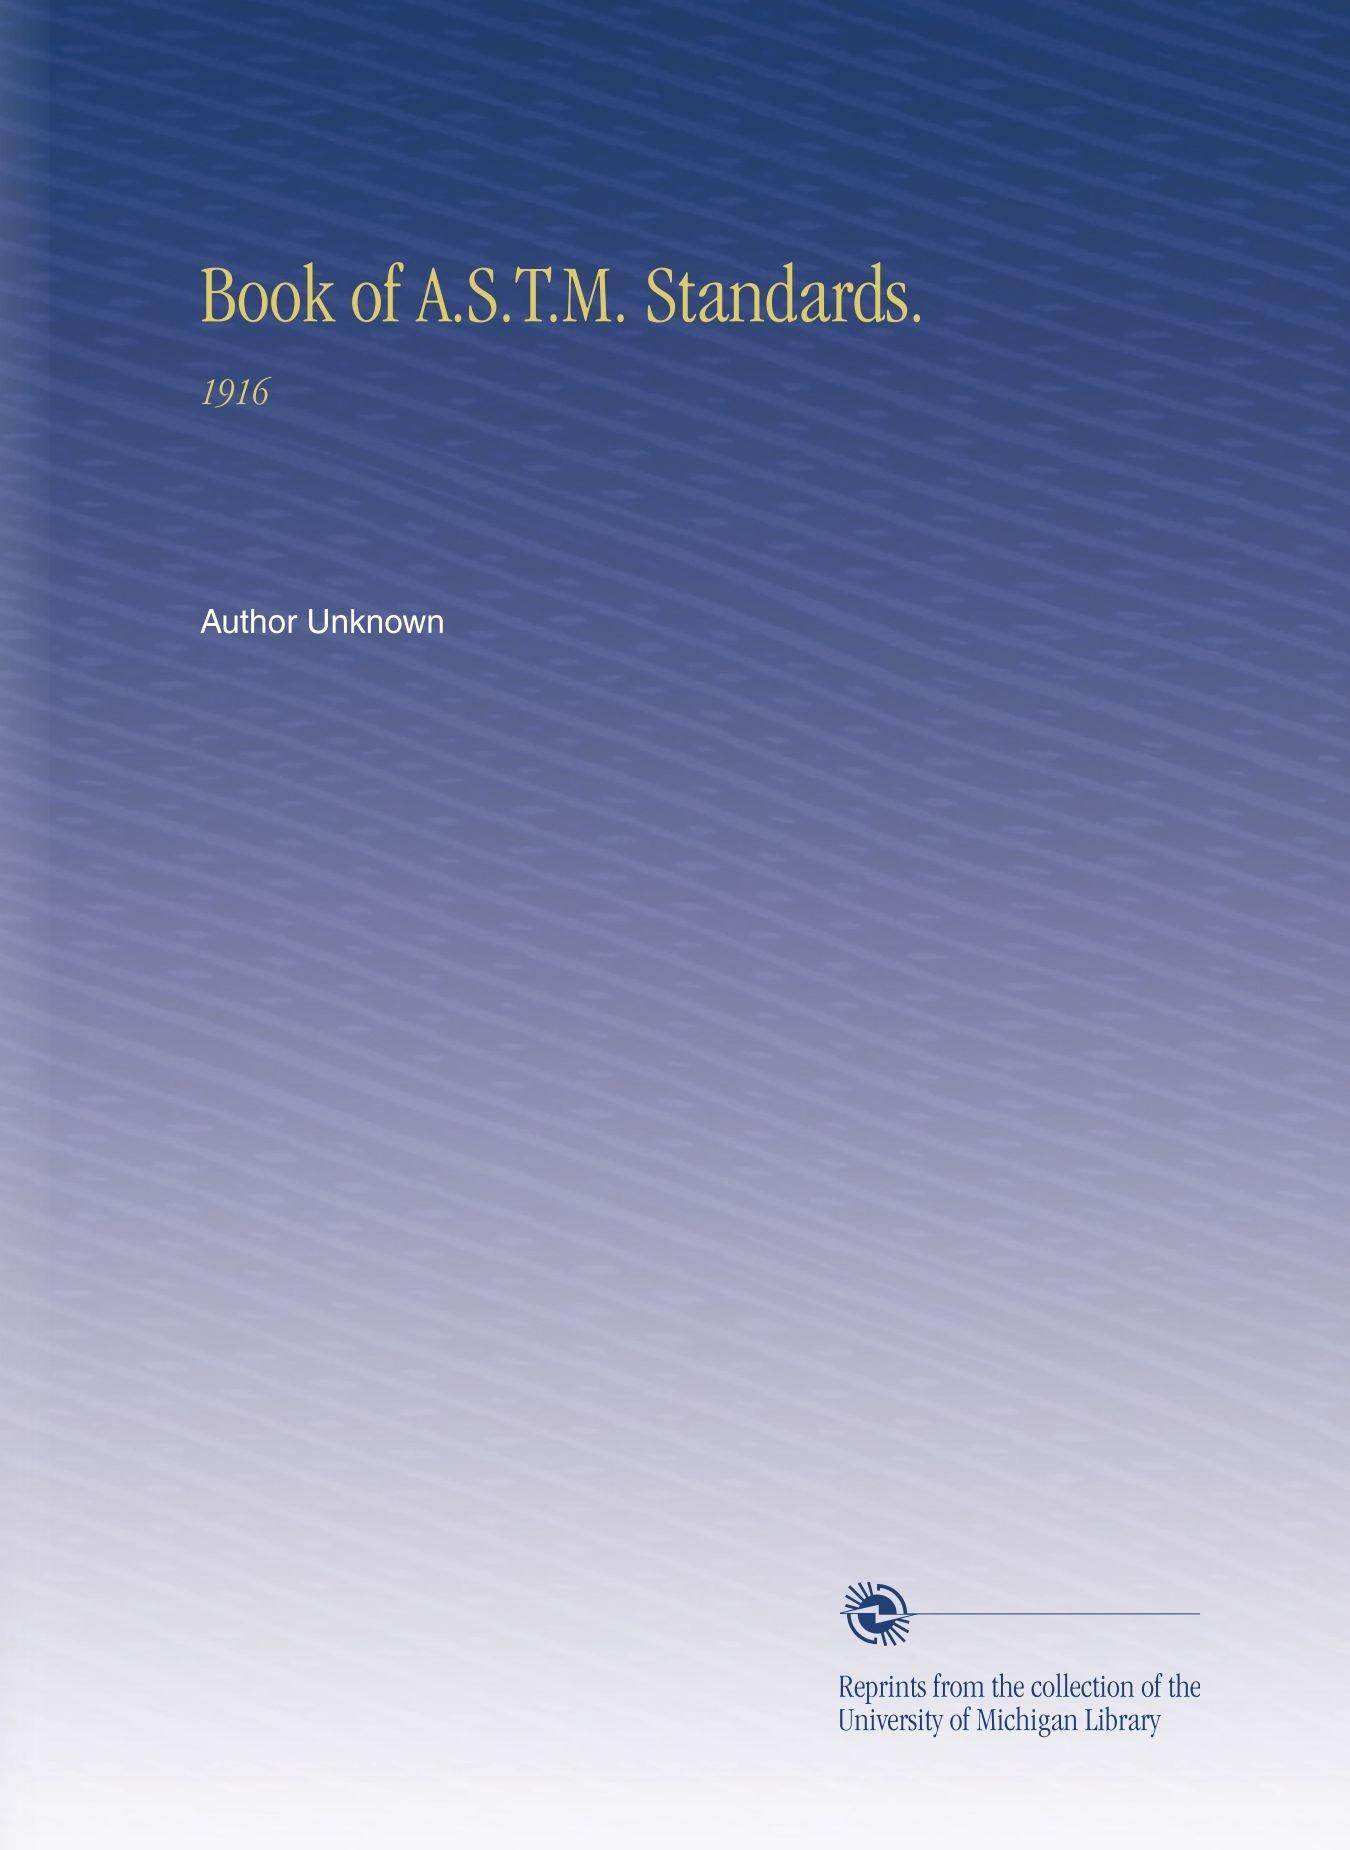 Book of A.S.T.M. Standards.: 1916 ebook